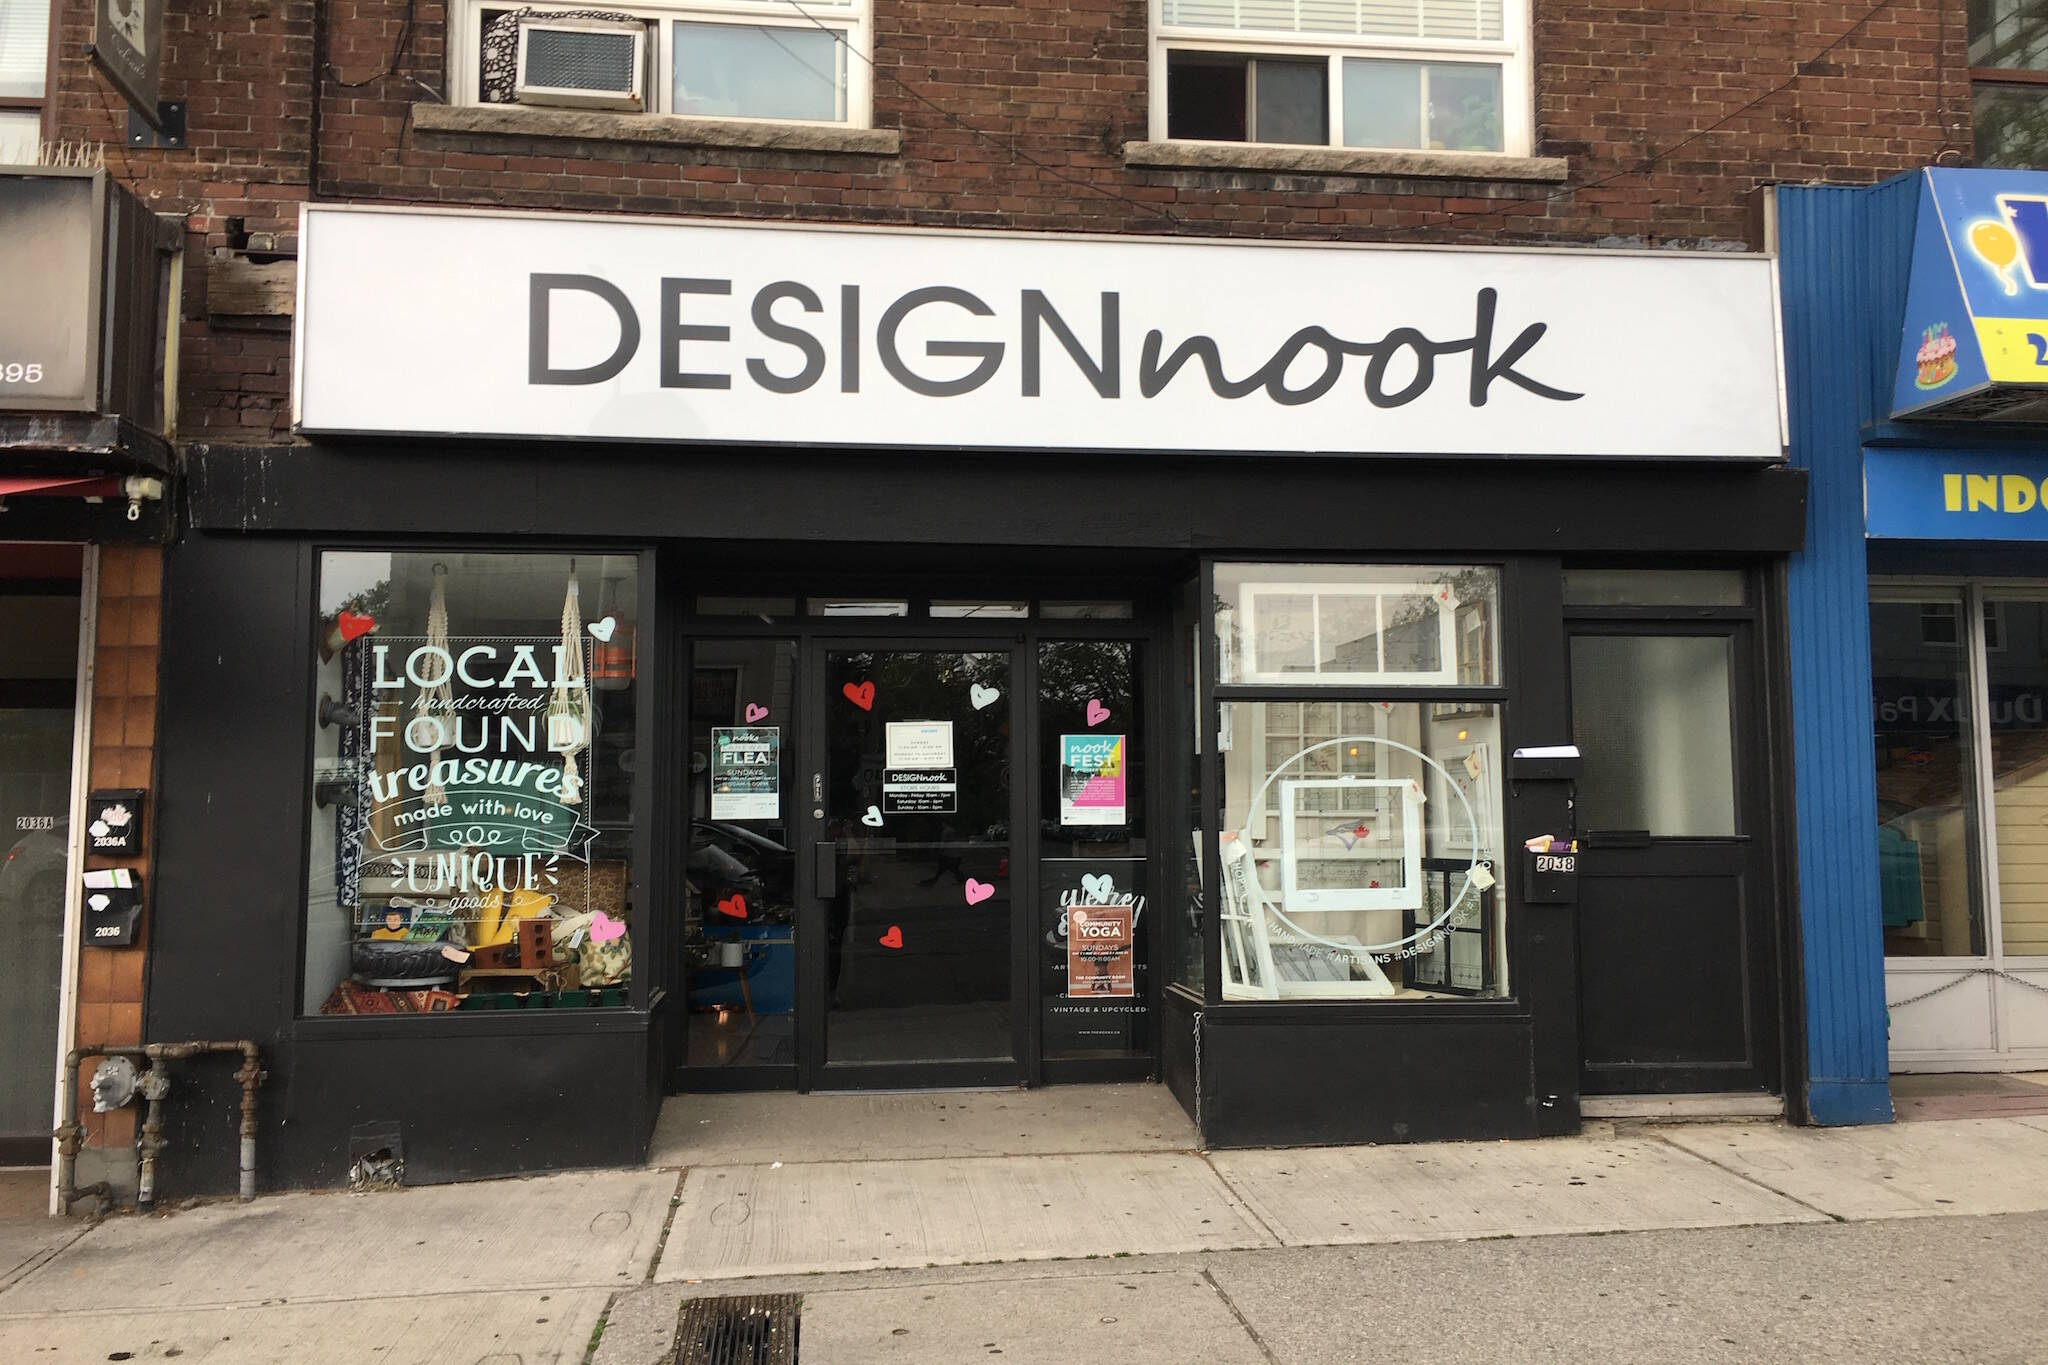 Design nook Toronto